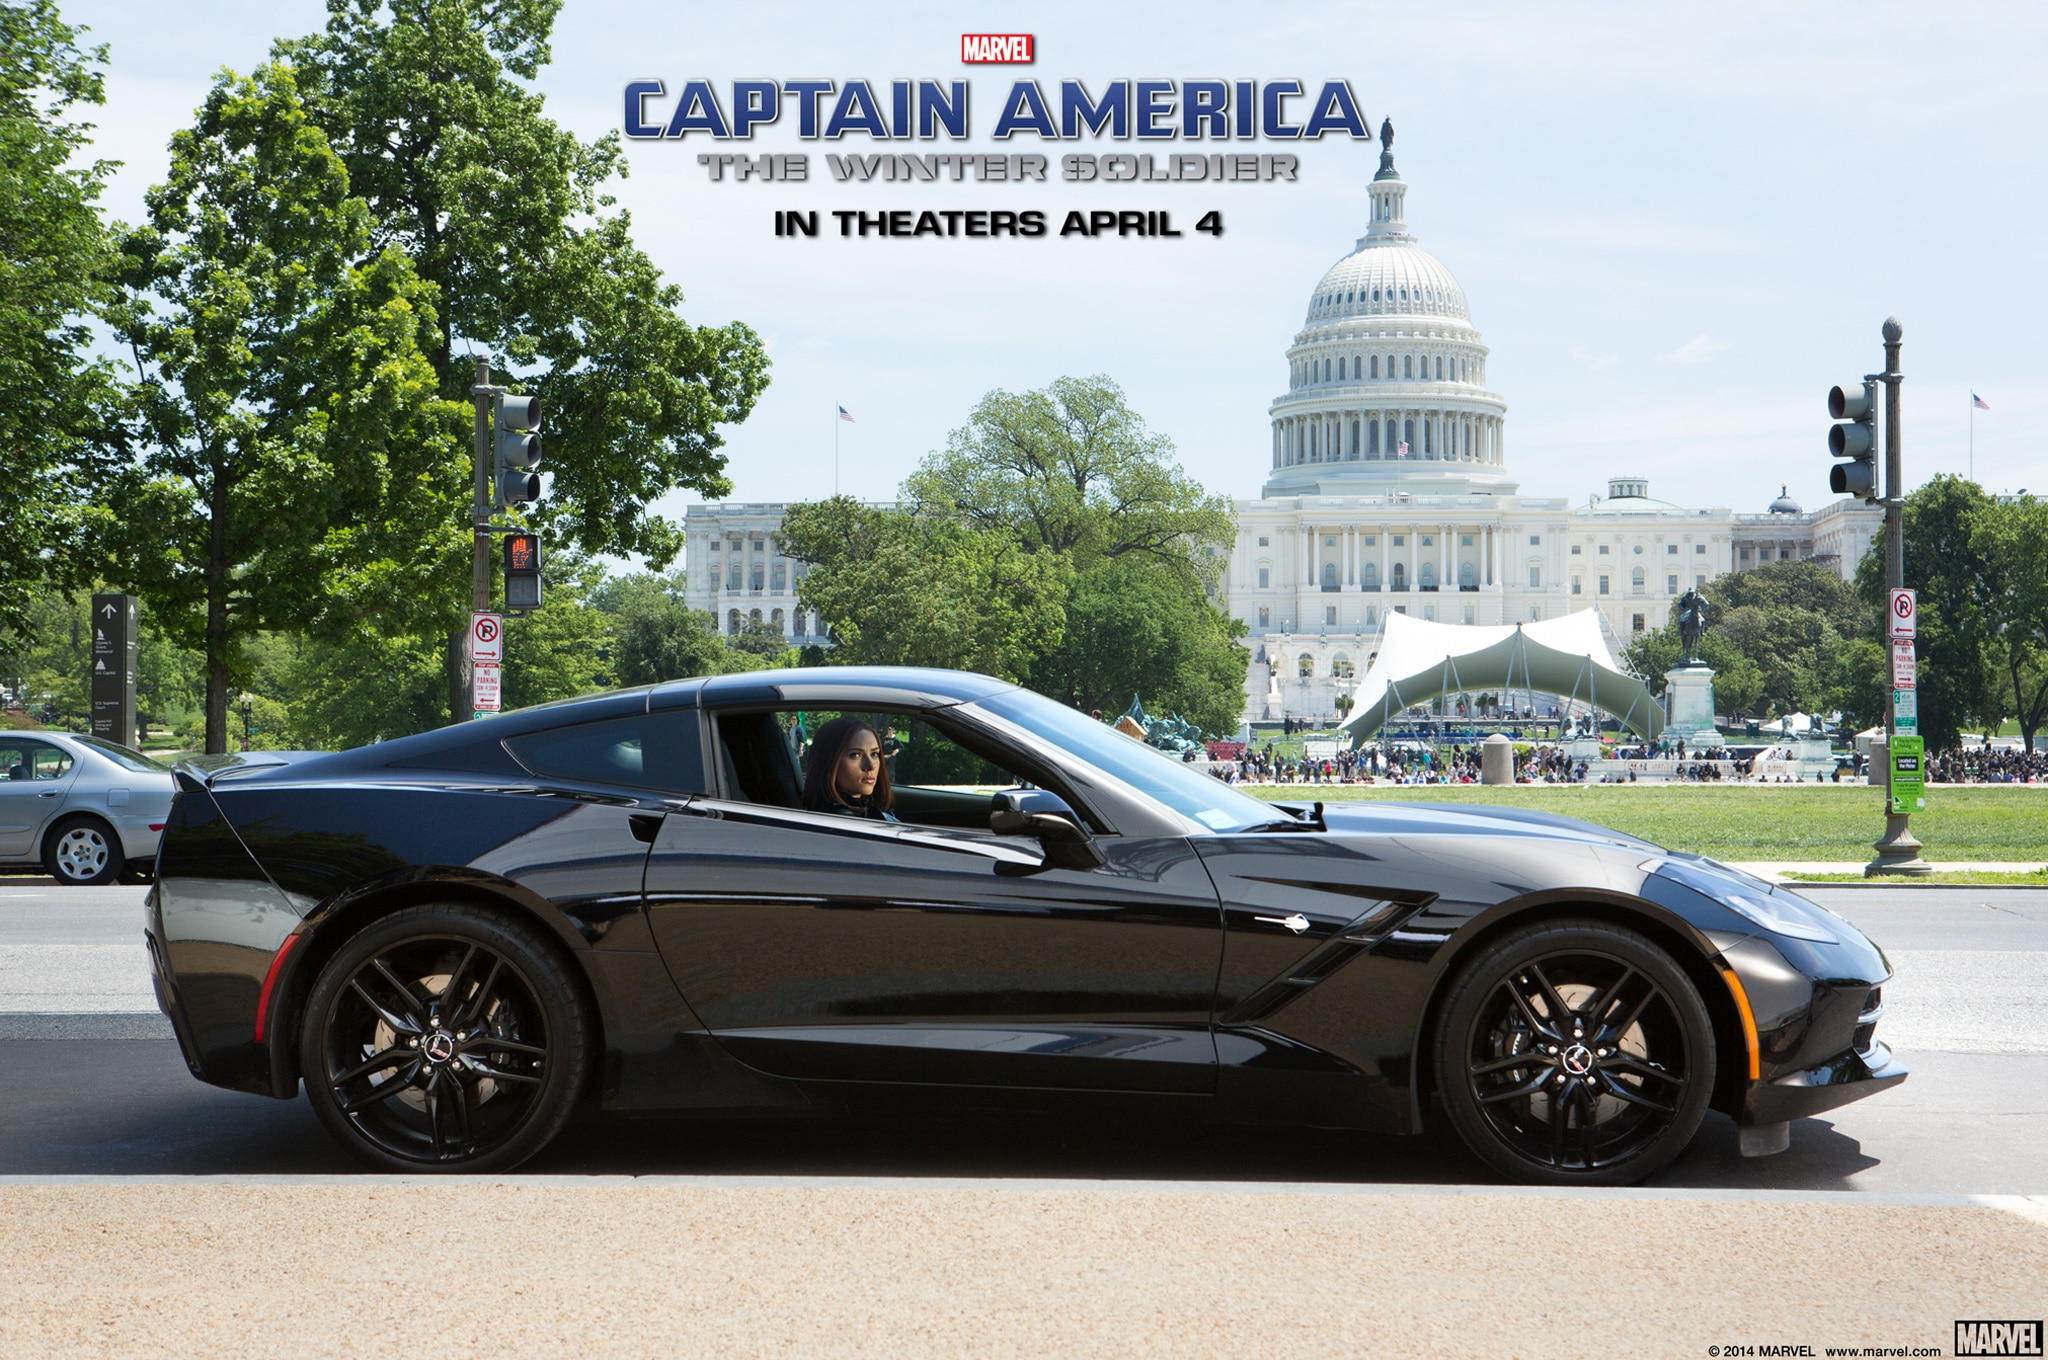 2014 Chevrolet Corvette Stingray Black Widow Captain America Profile1